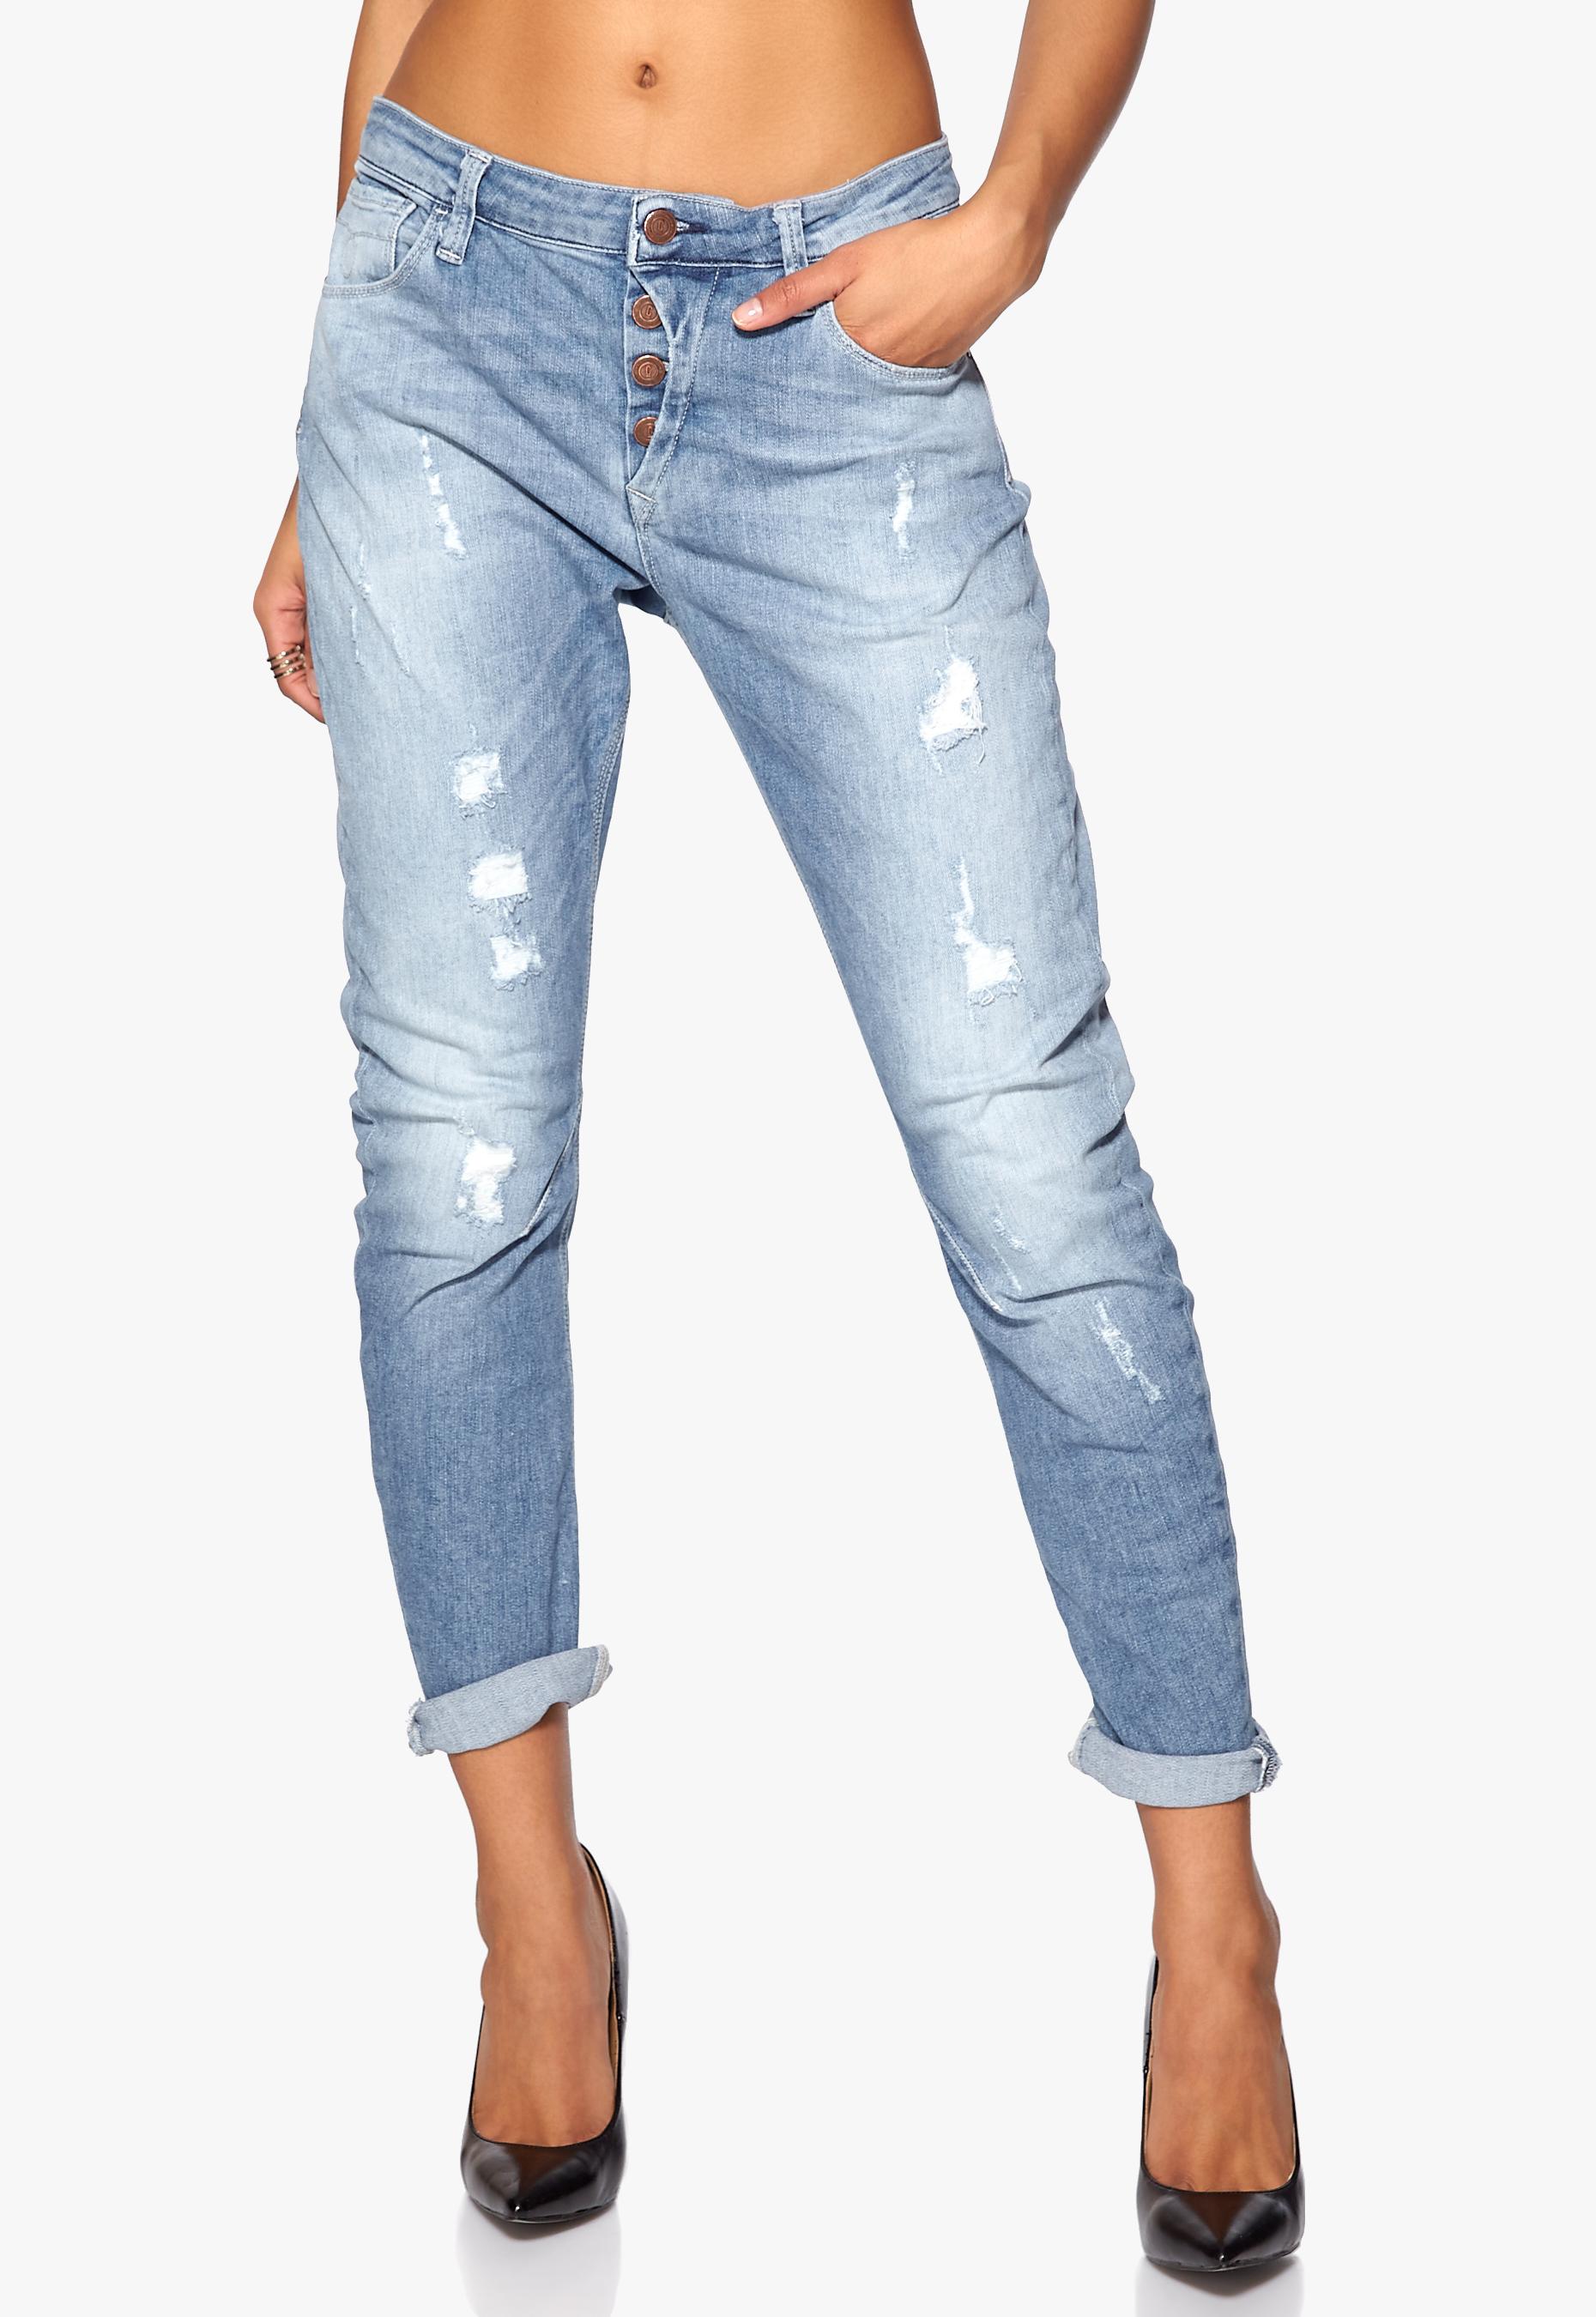 972773f1d729 OBJECT Mille Jeans Light Blue Denim - Bubbleroom